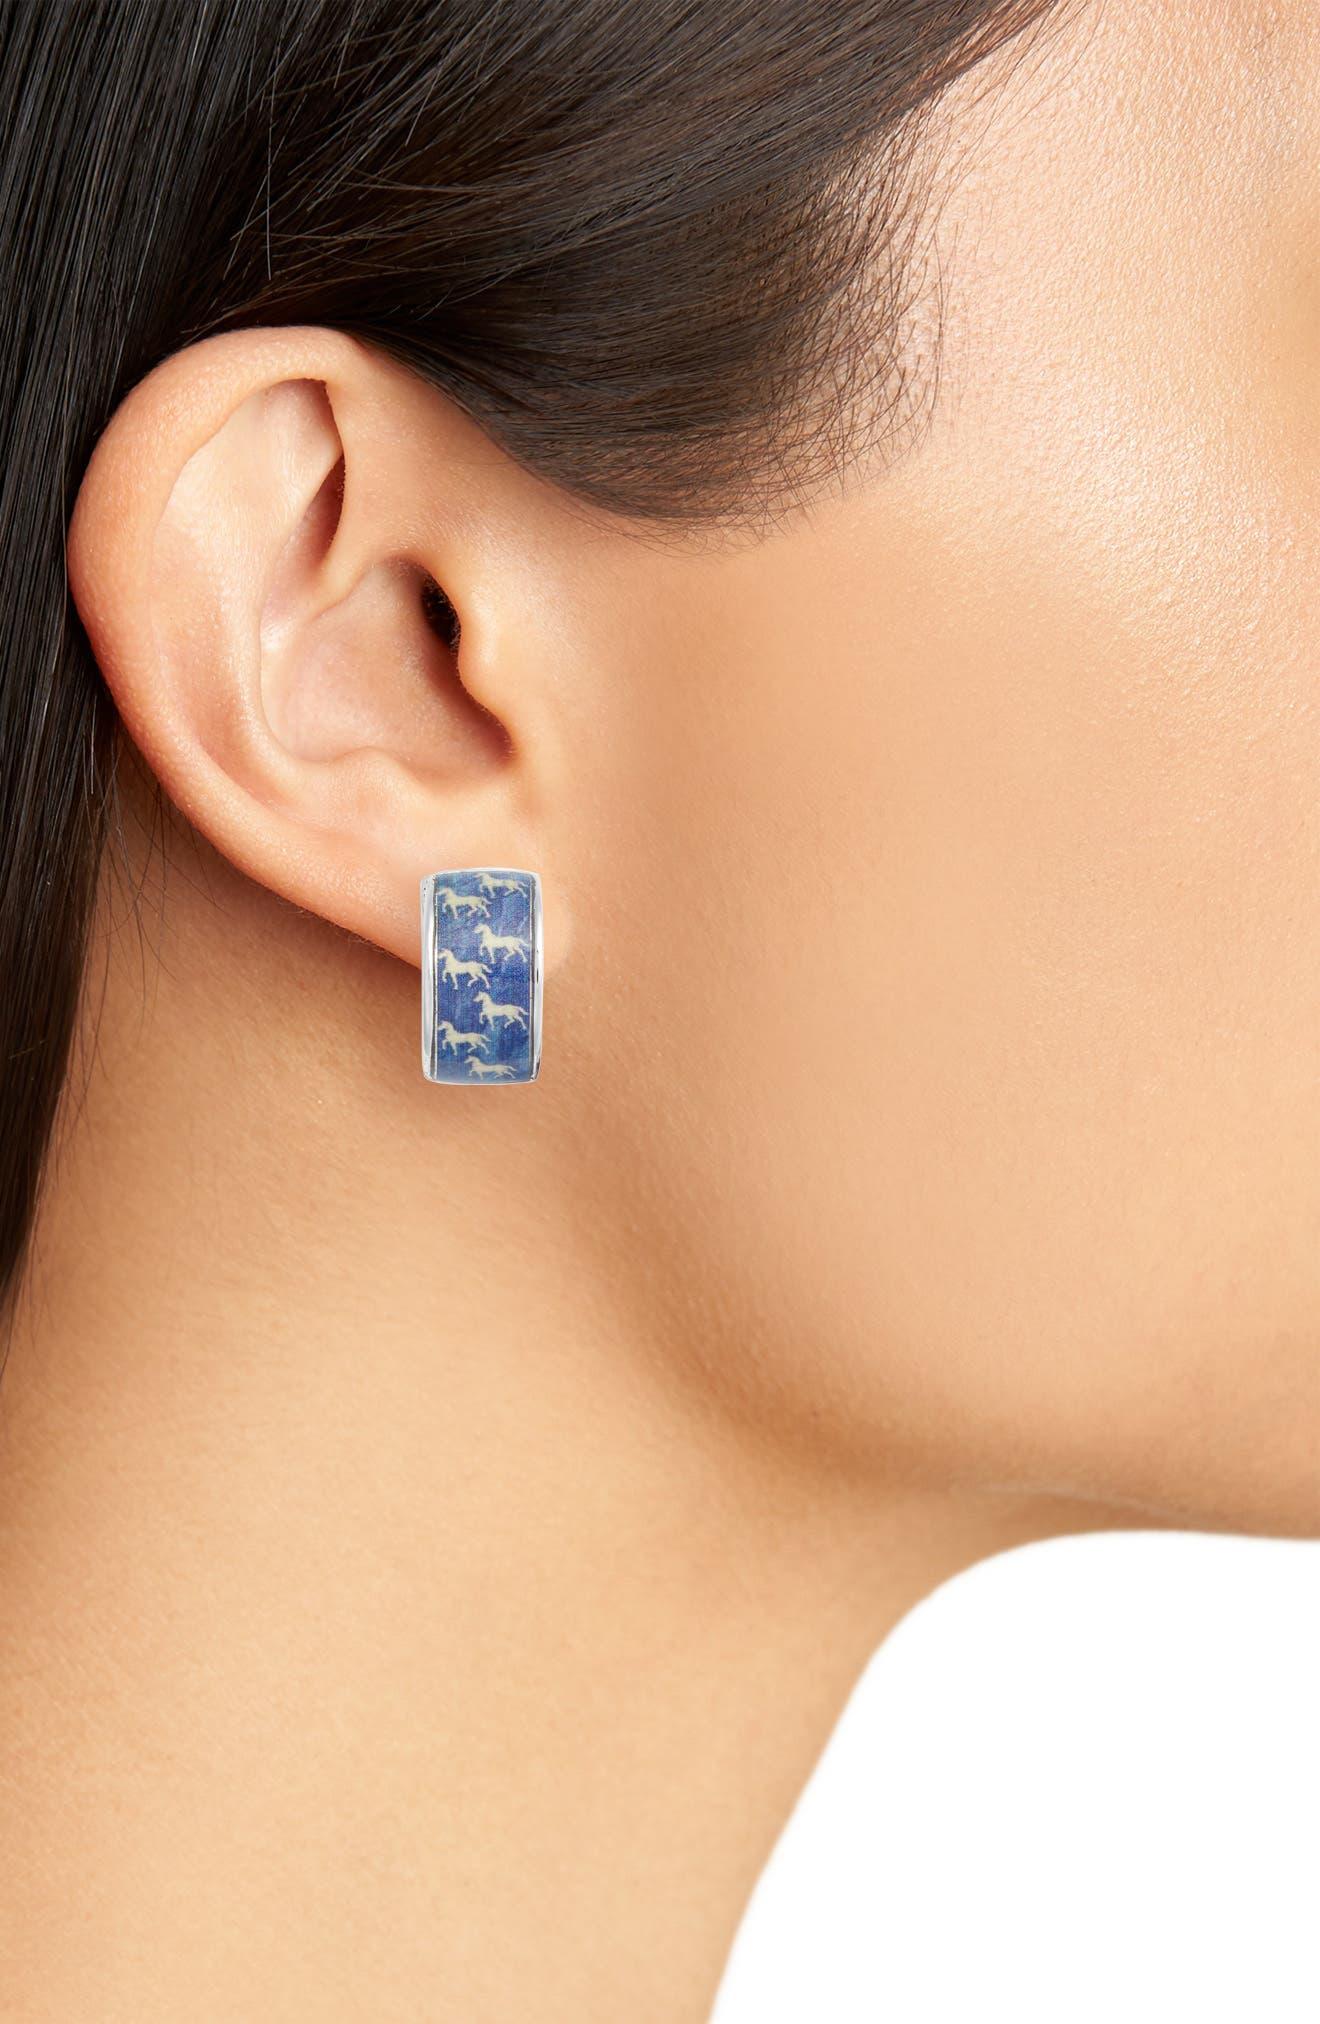 Blue Silvertone Blue Horse Earrings,                             Alternate thumbnail 2, color,                             BLUE